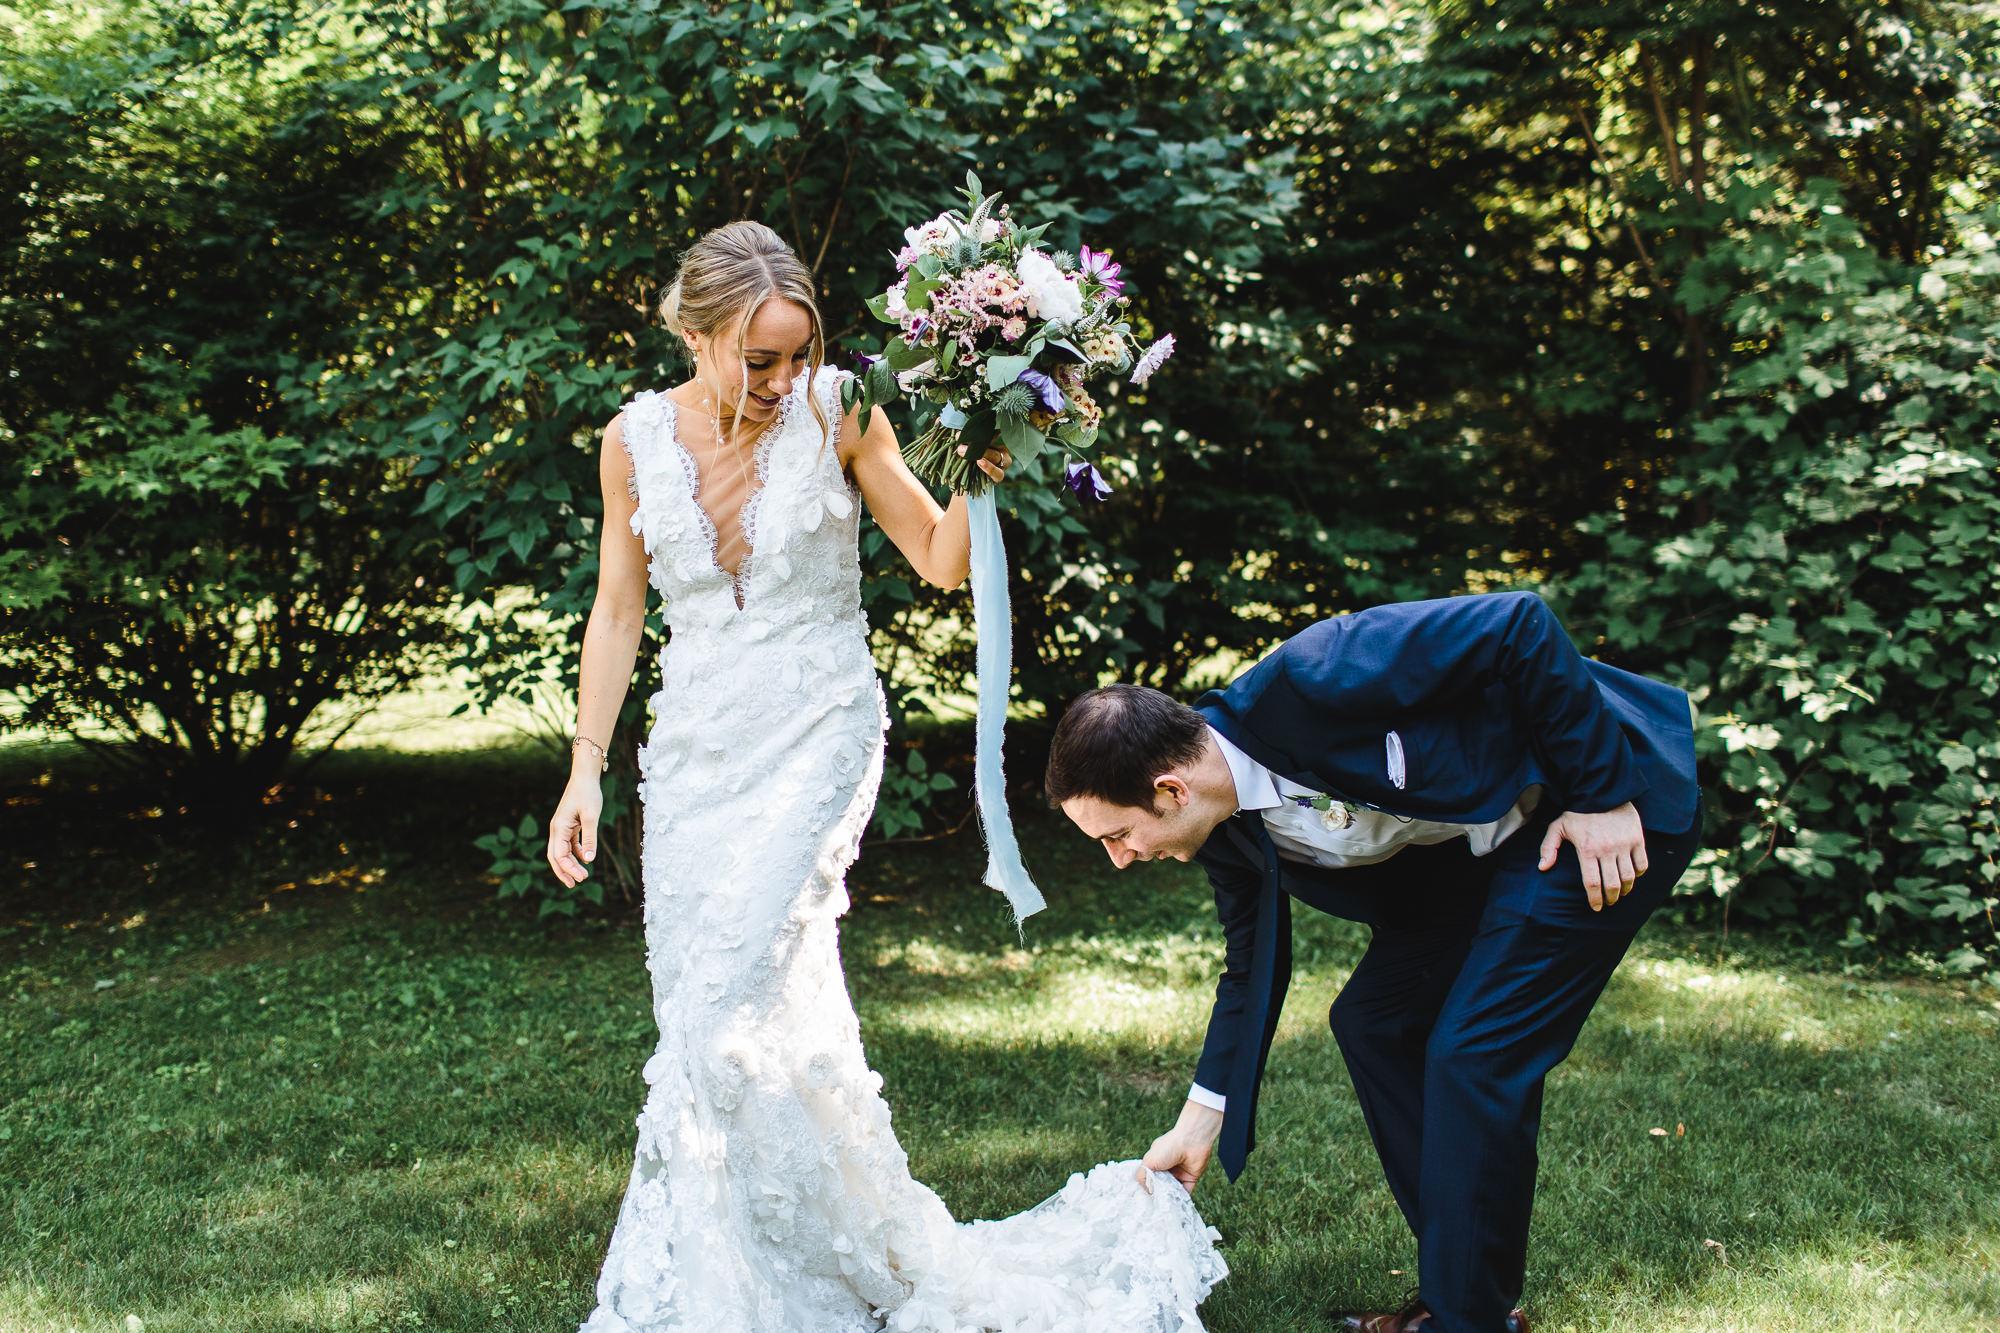 connecticut-summer-lake-wedding-emily-kirke-photography-upstyle (44 of 181).jpg